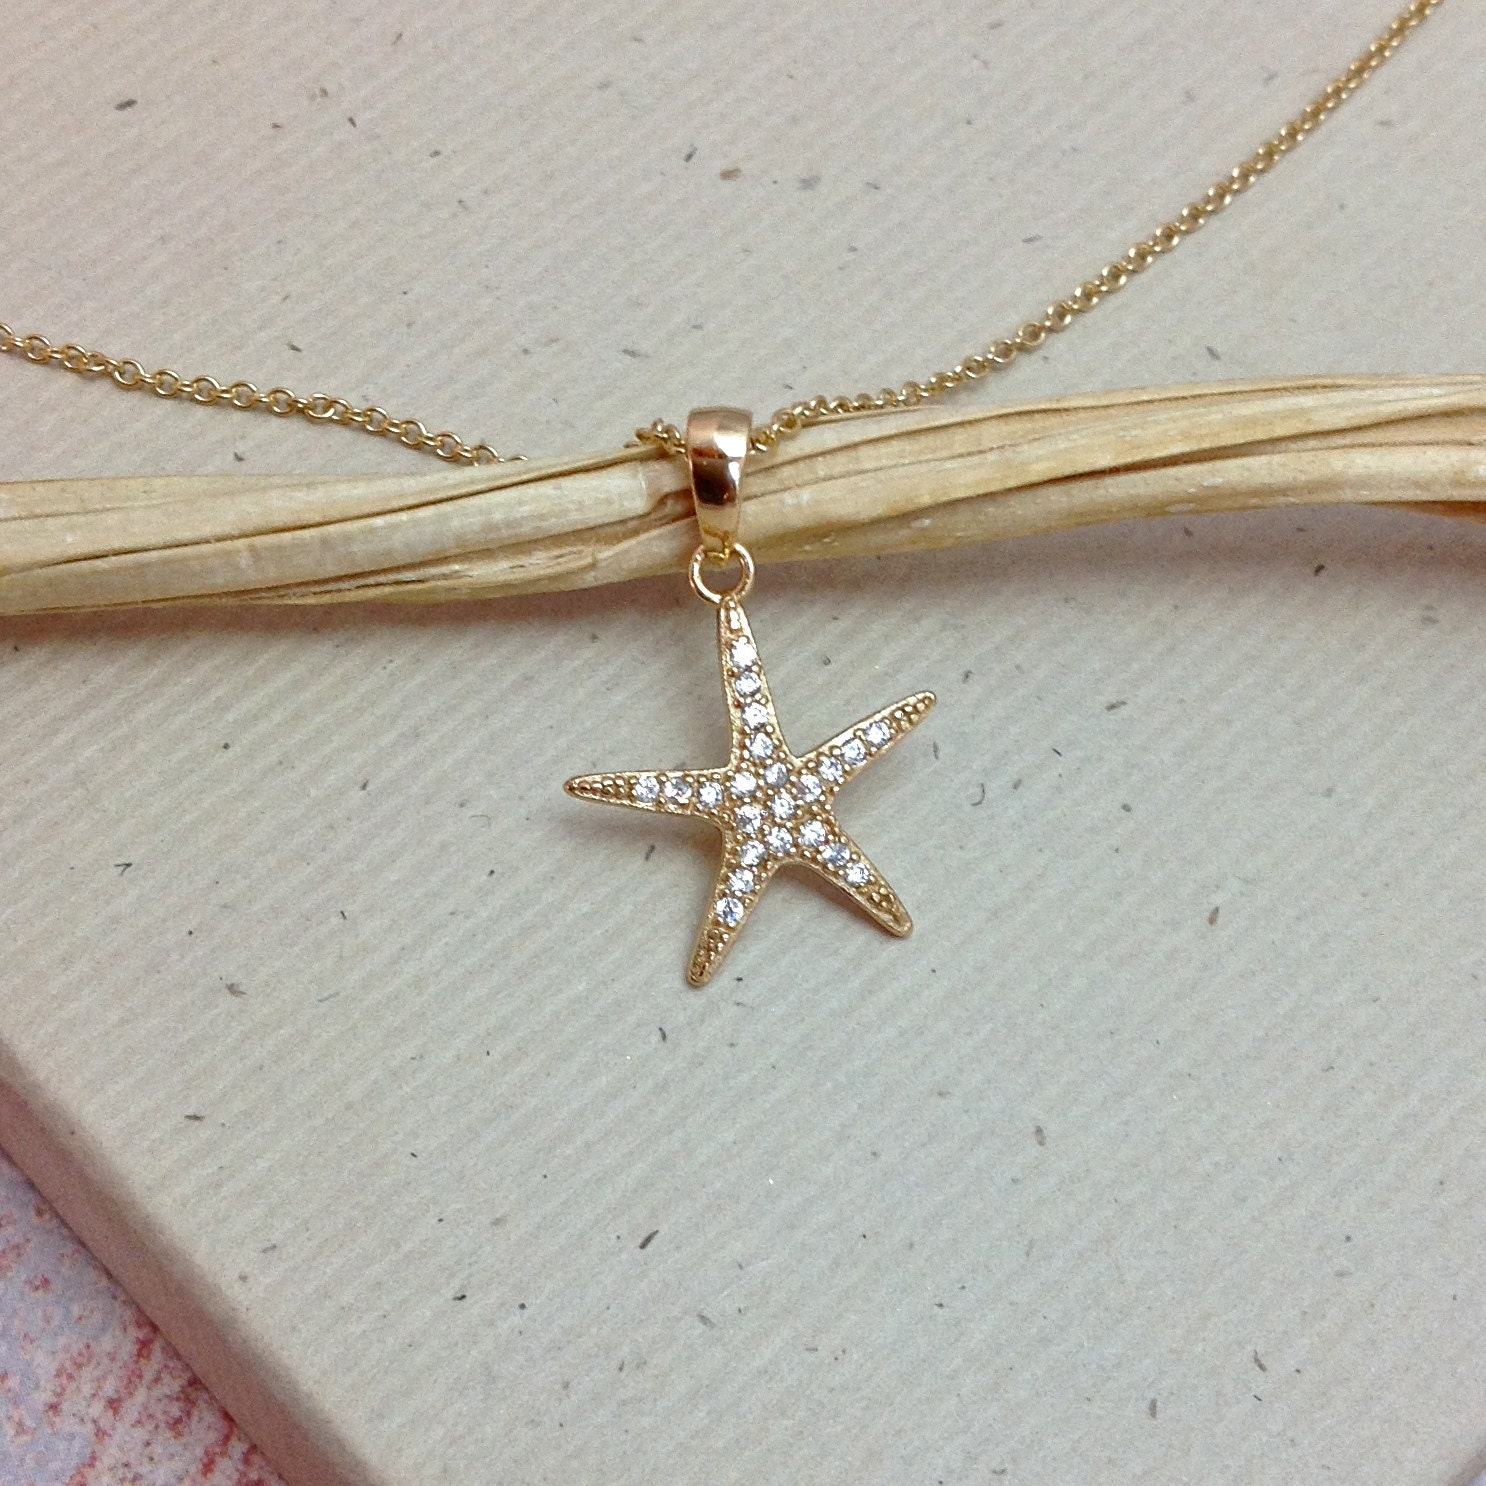 Starfish Necklace Gold Star Fish Cz Cubic By Wendyshraydesigns